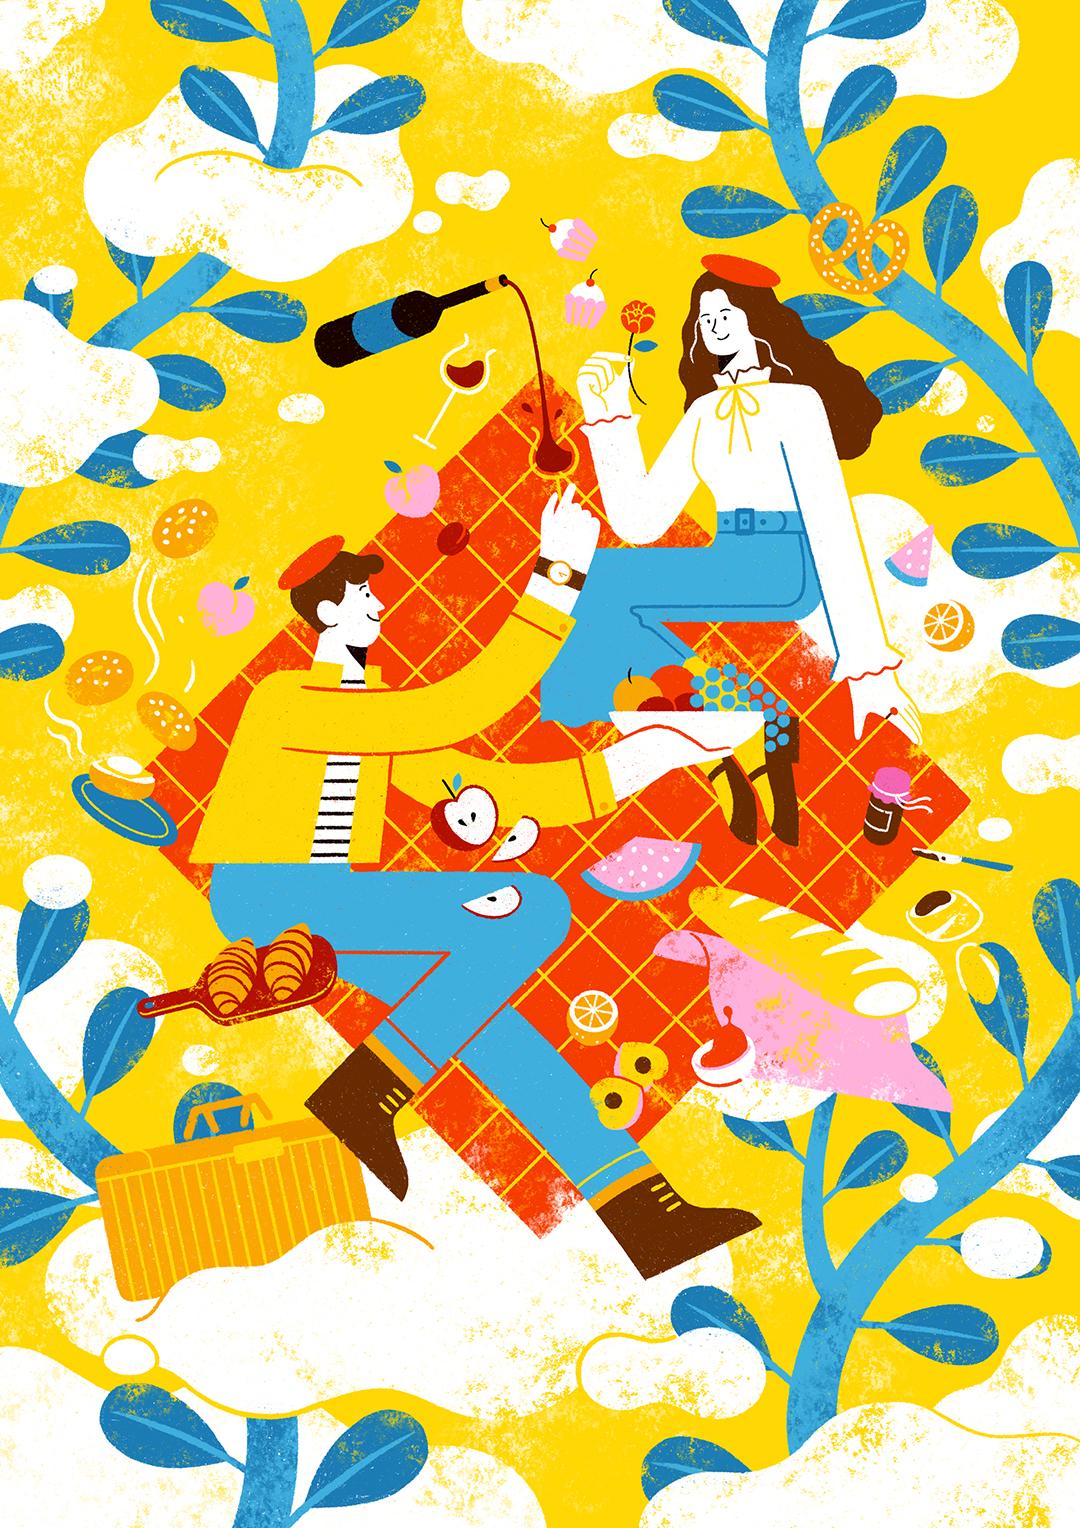 GirlsclubAsia-Illustrator-Lai Huili-010